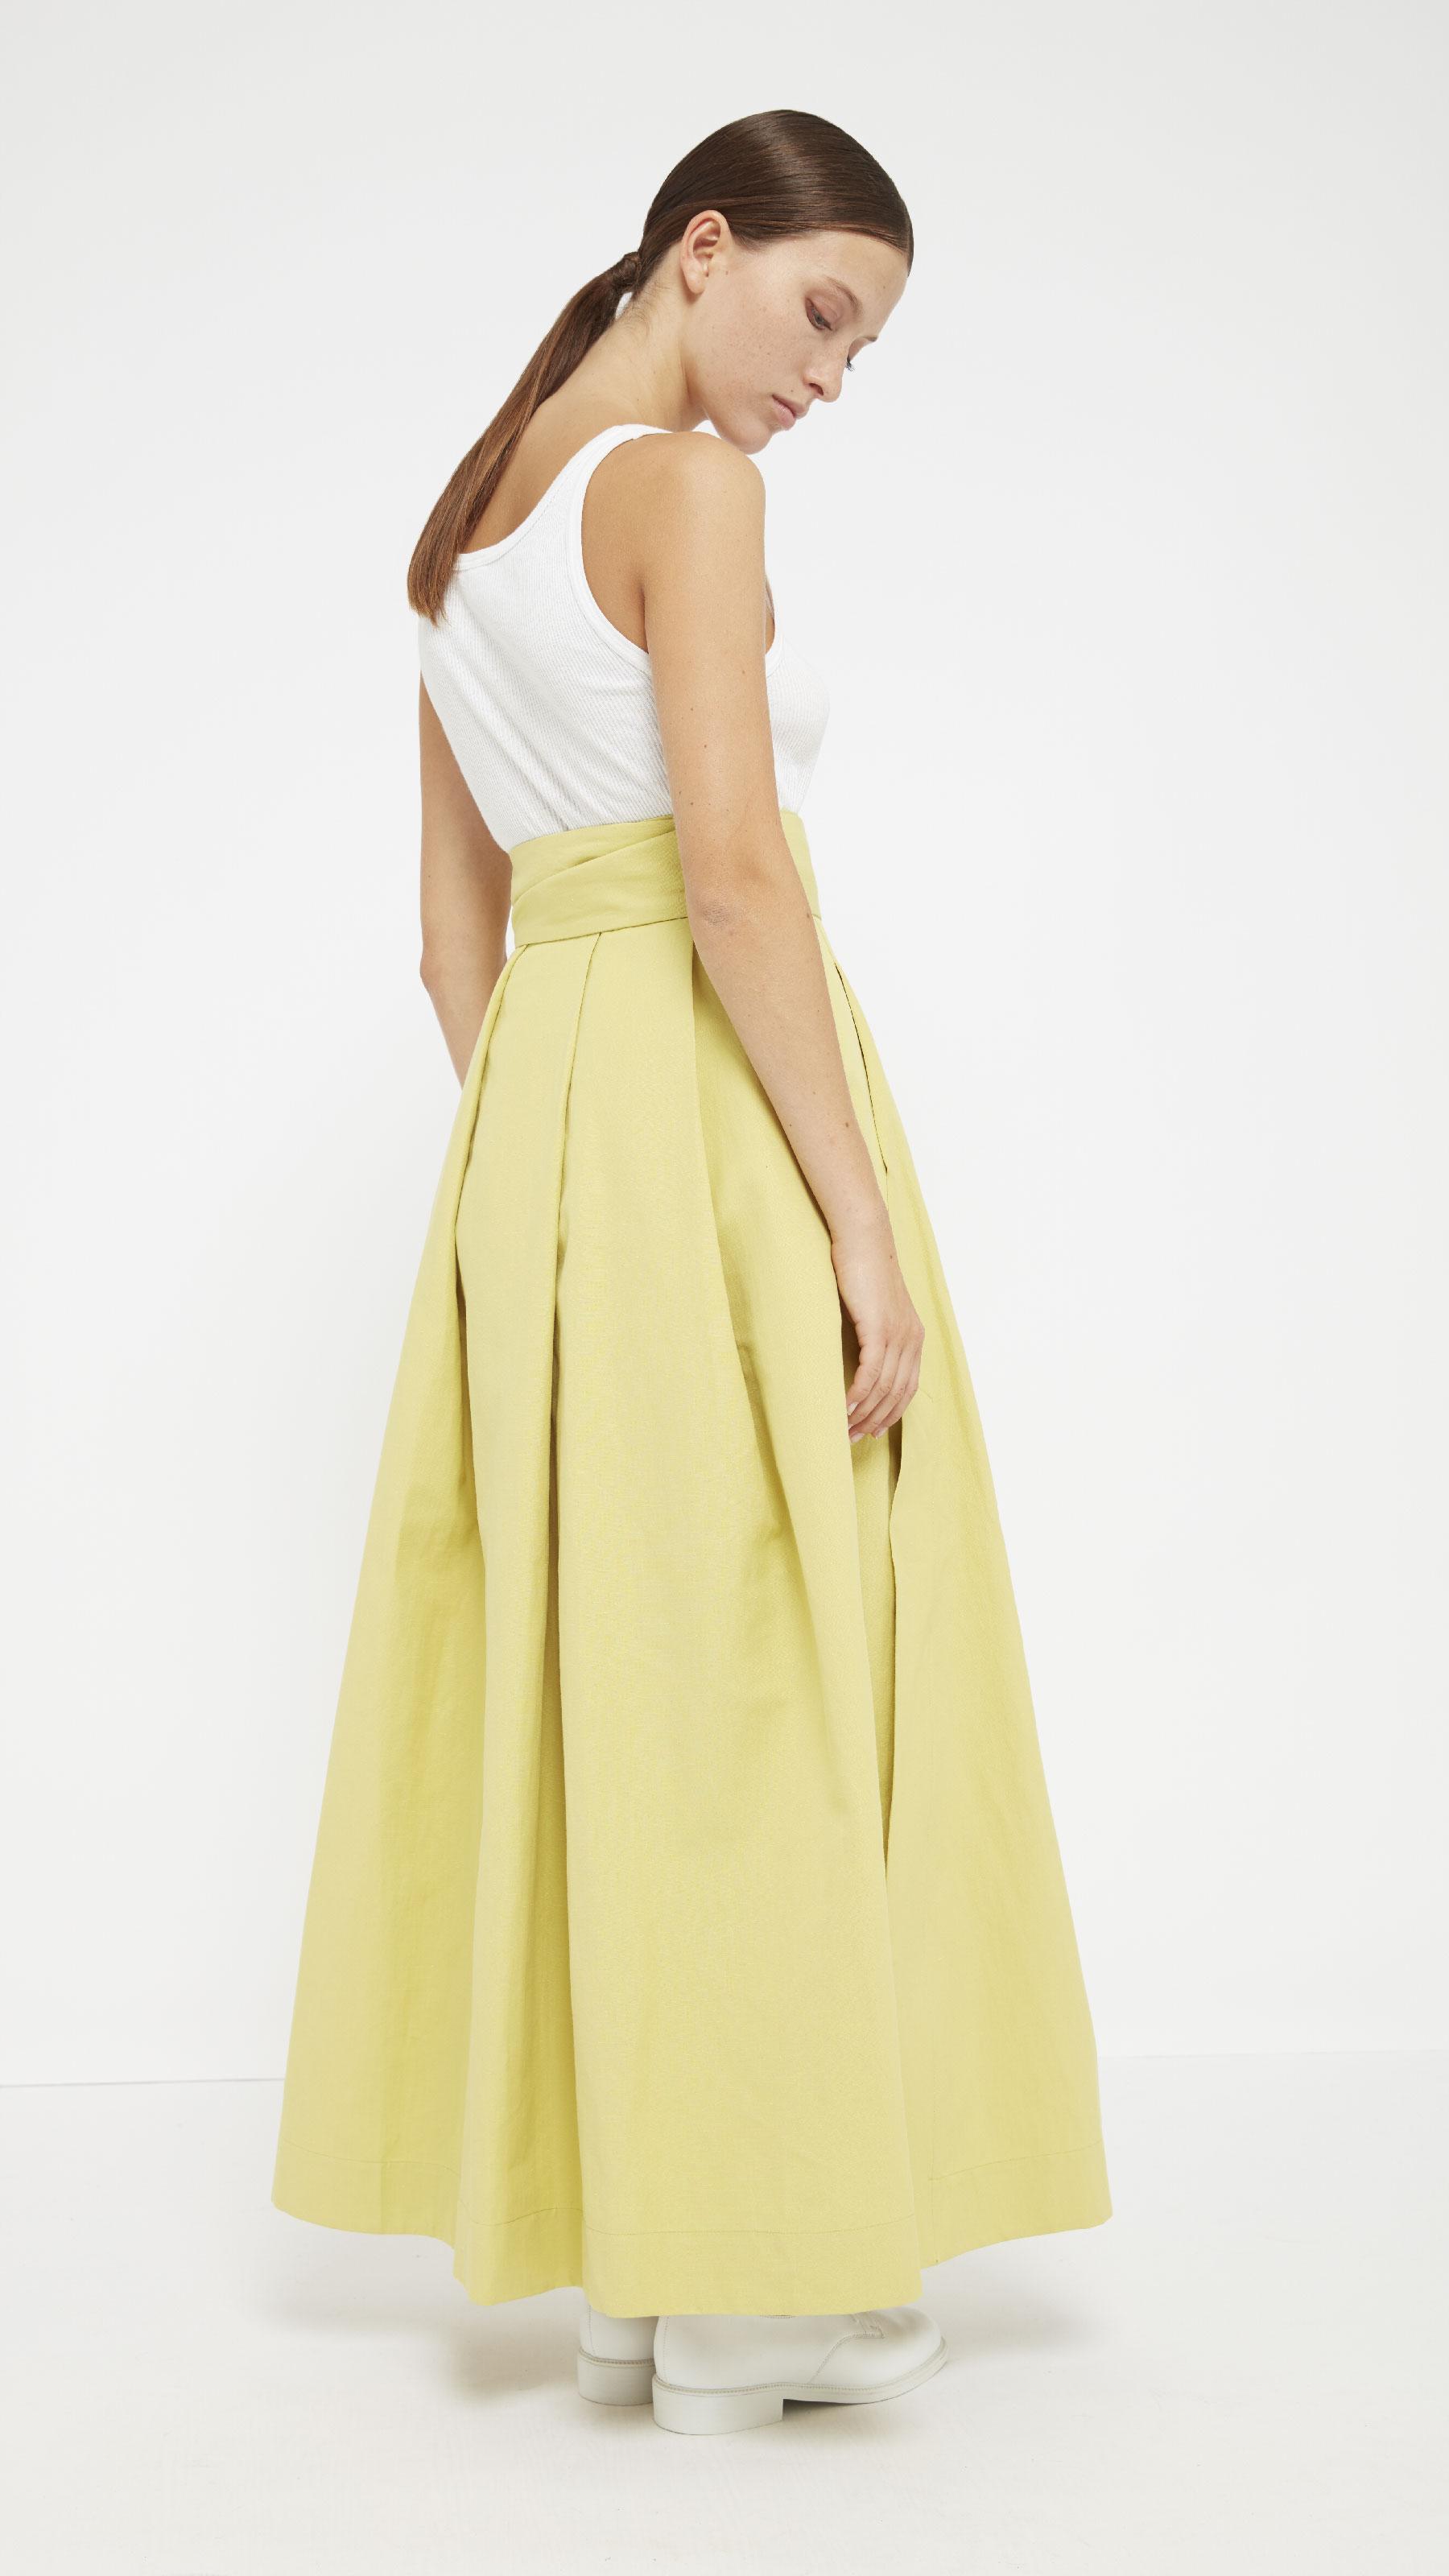 dada-diane-ducasse-jupe-longue-coton-lin-jaune-pe-17-dos